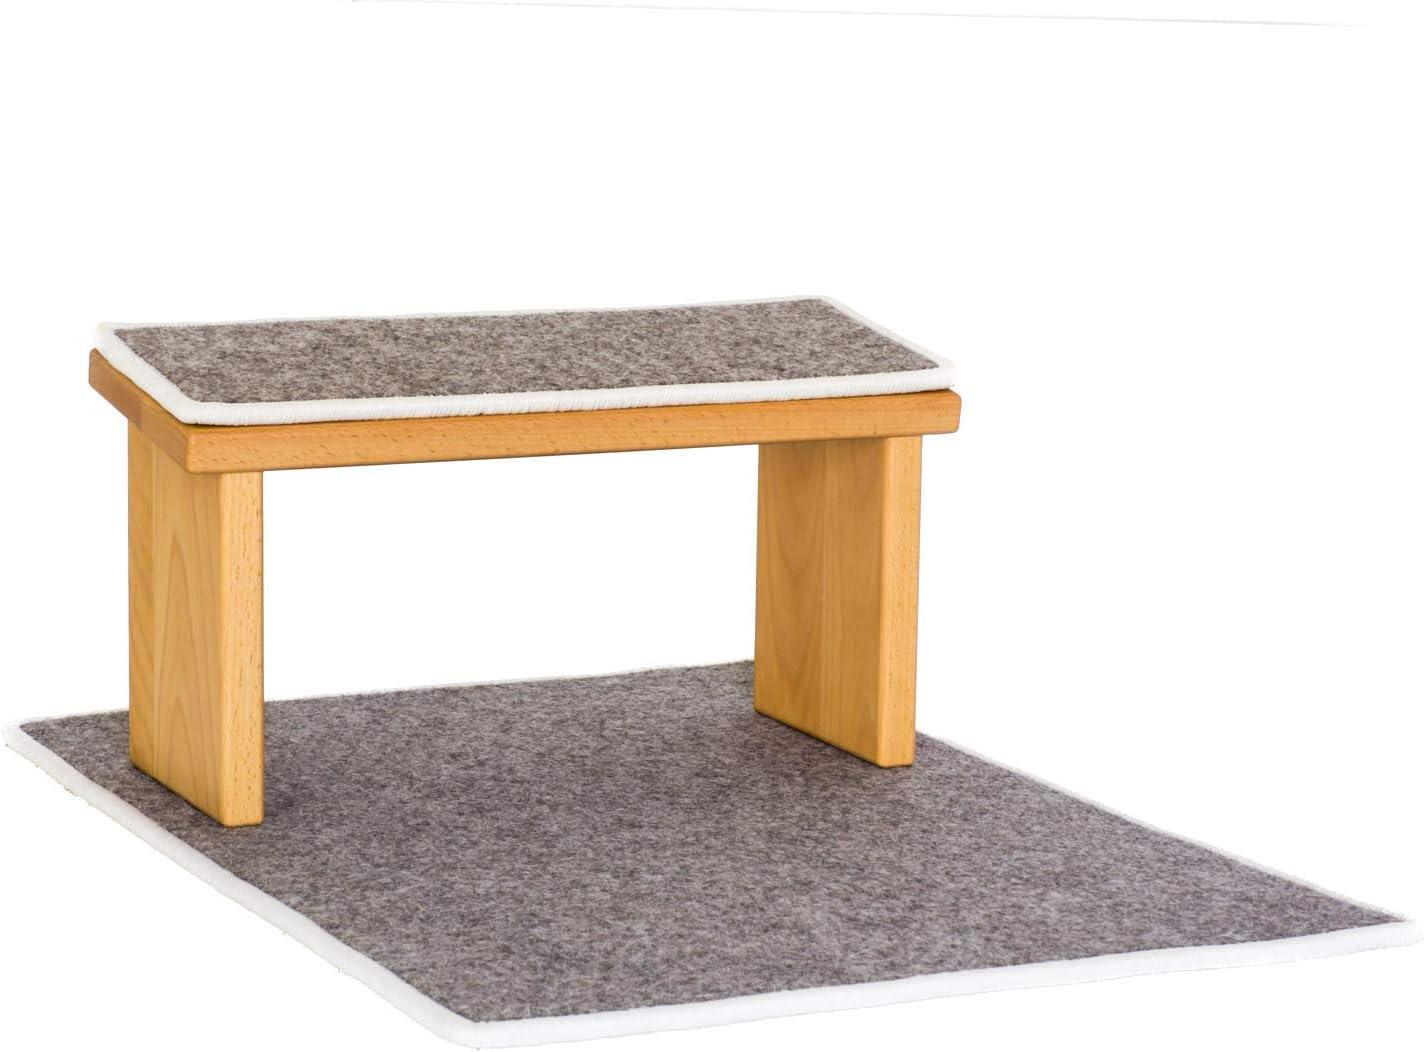 Stork Optional mit MeditationsMatte /& Polster Verschiedene H/öhen Edelholz Gutes zum Leben Meditationsbank Holz Klappbare